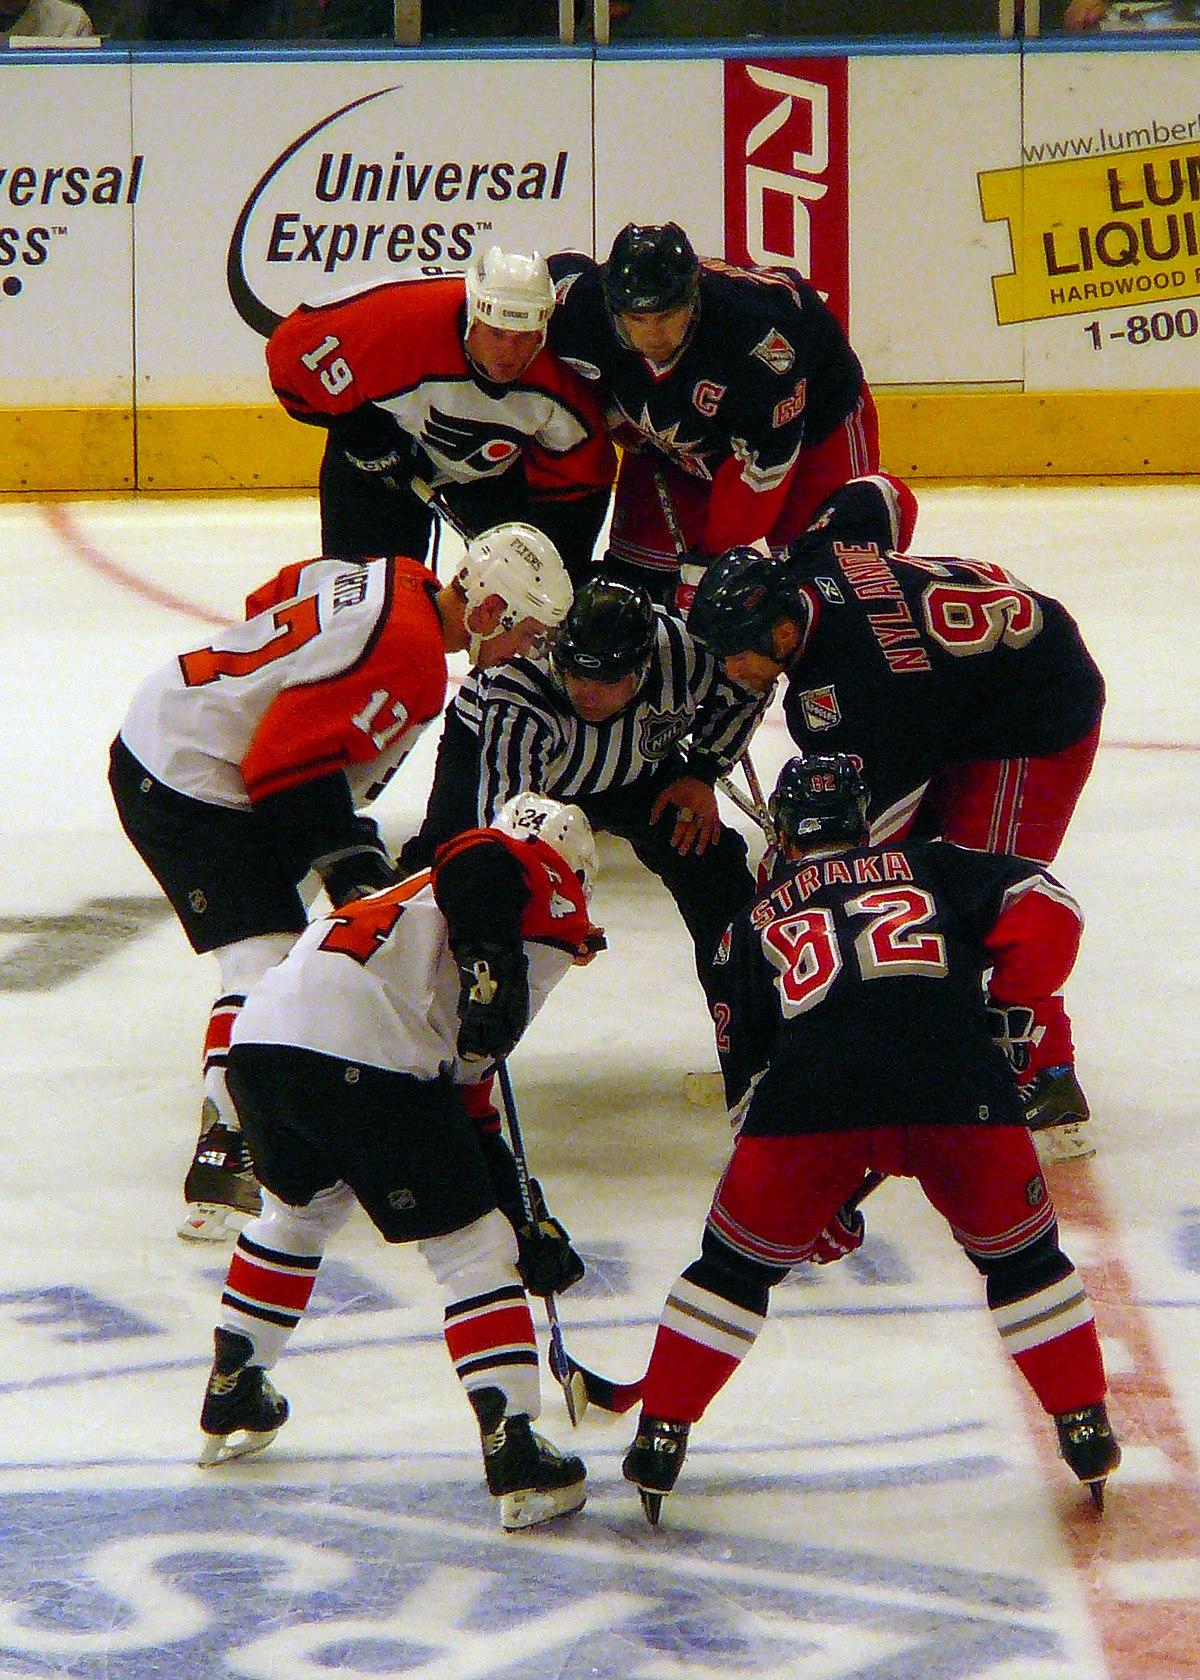 national hockey league rivalries